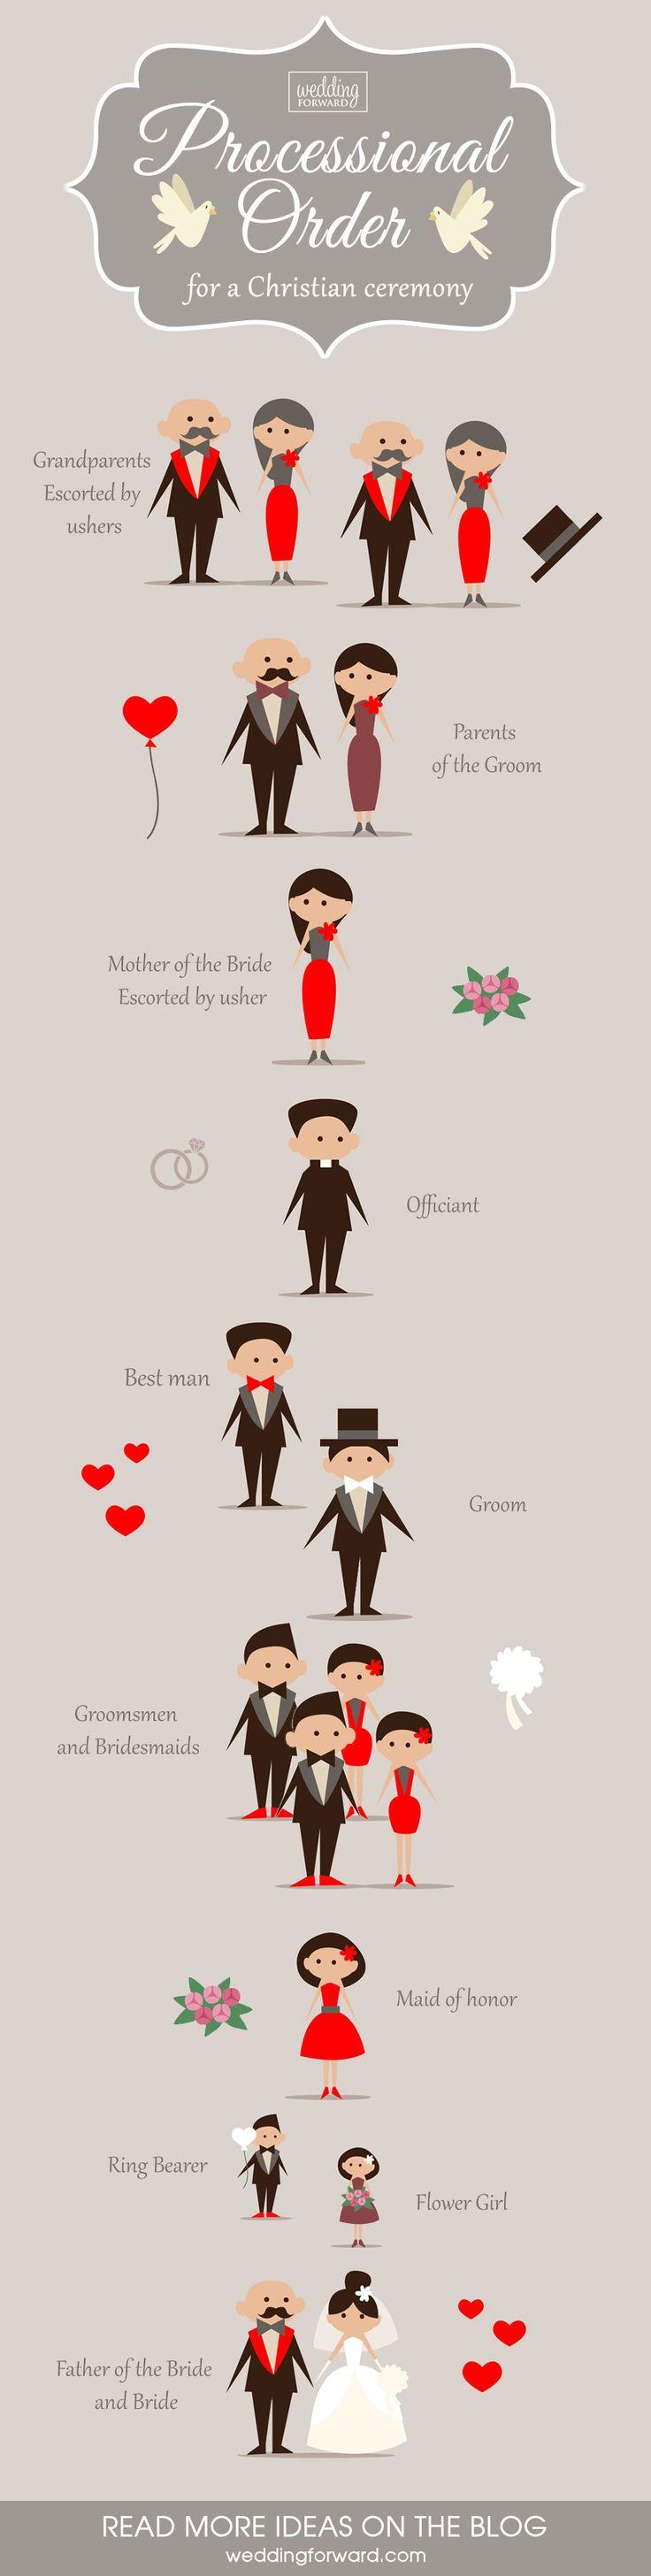 Wedding Processional Order: 4 Ideas And Rules ❤ See more: http://www.weddingforward.com/wedding-processional-order/ #weddings